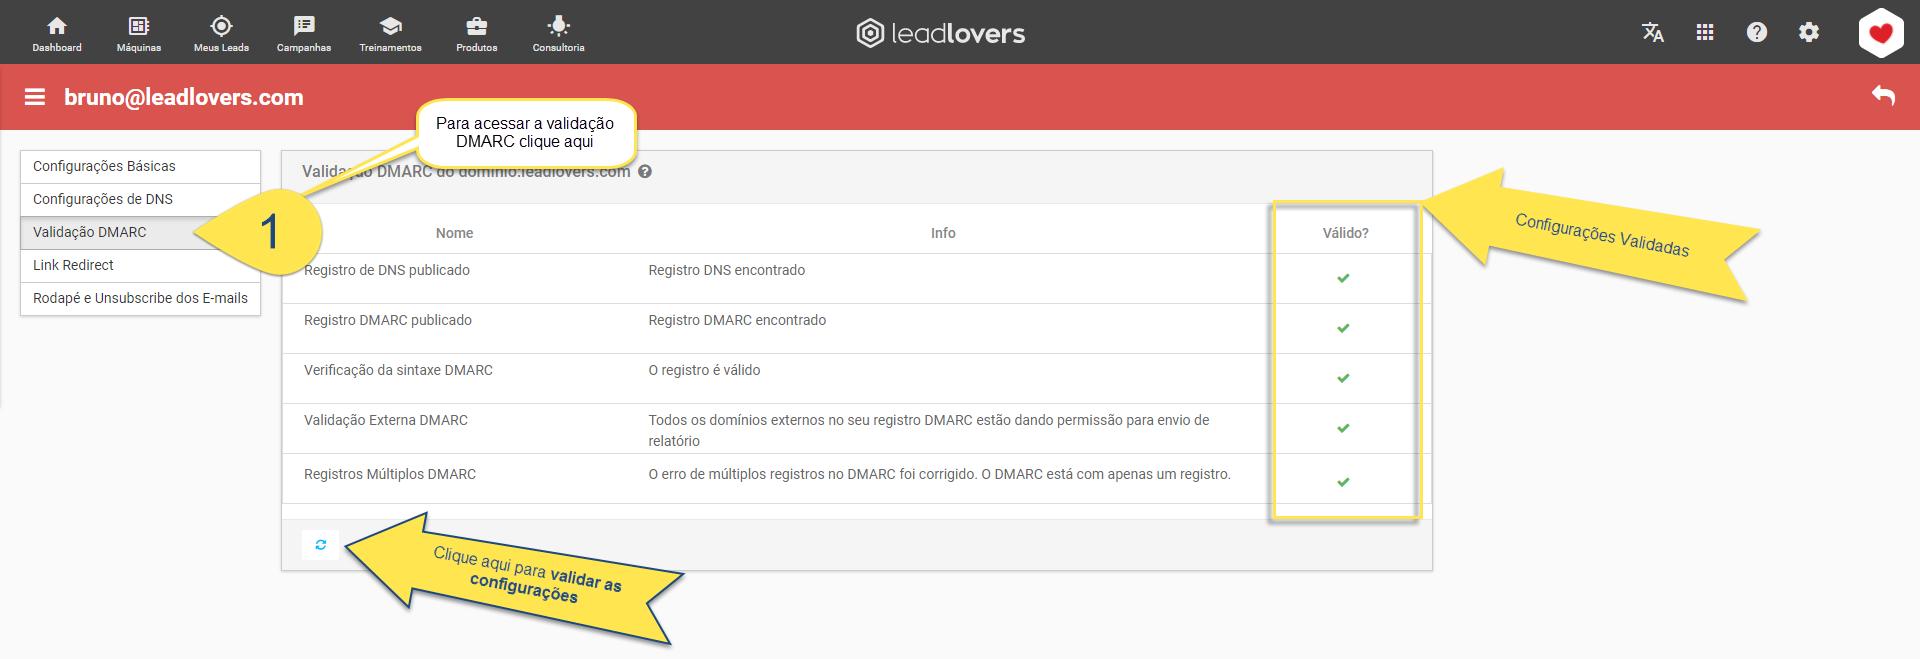 leadlovers-dns1